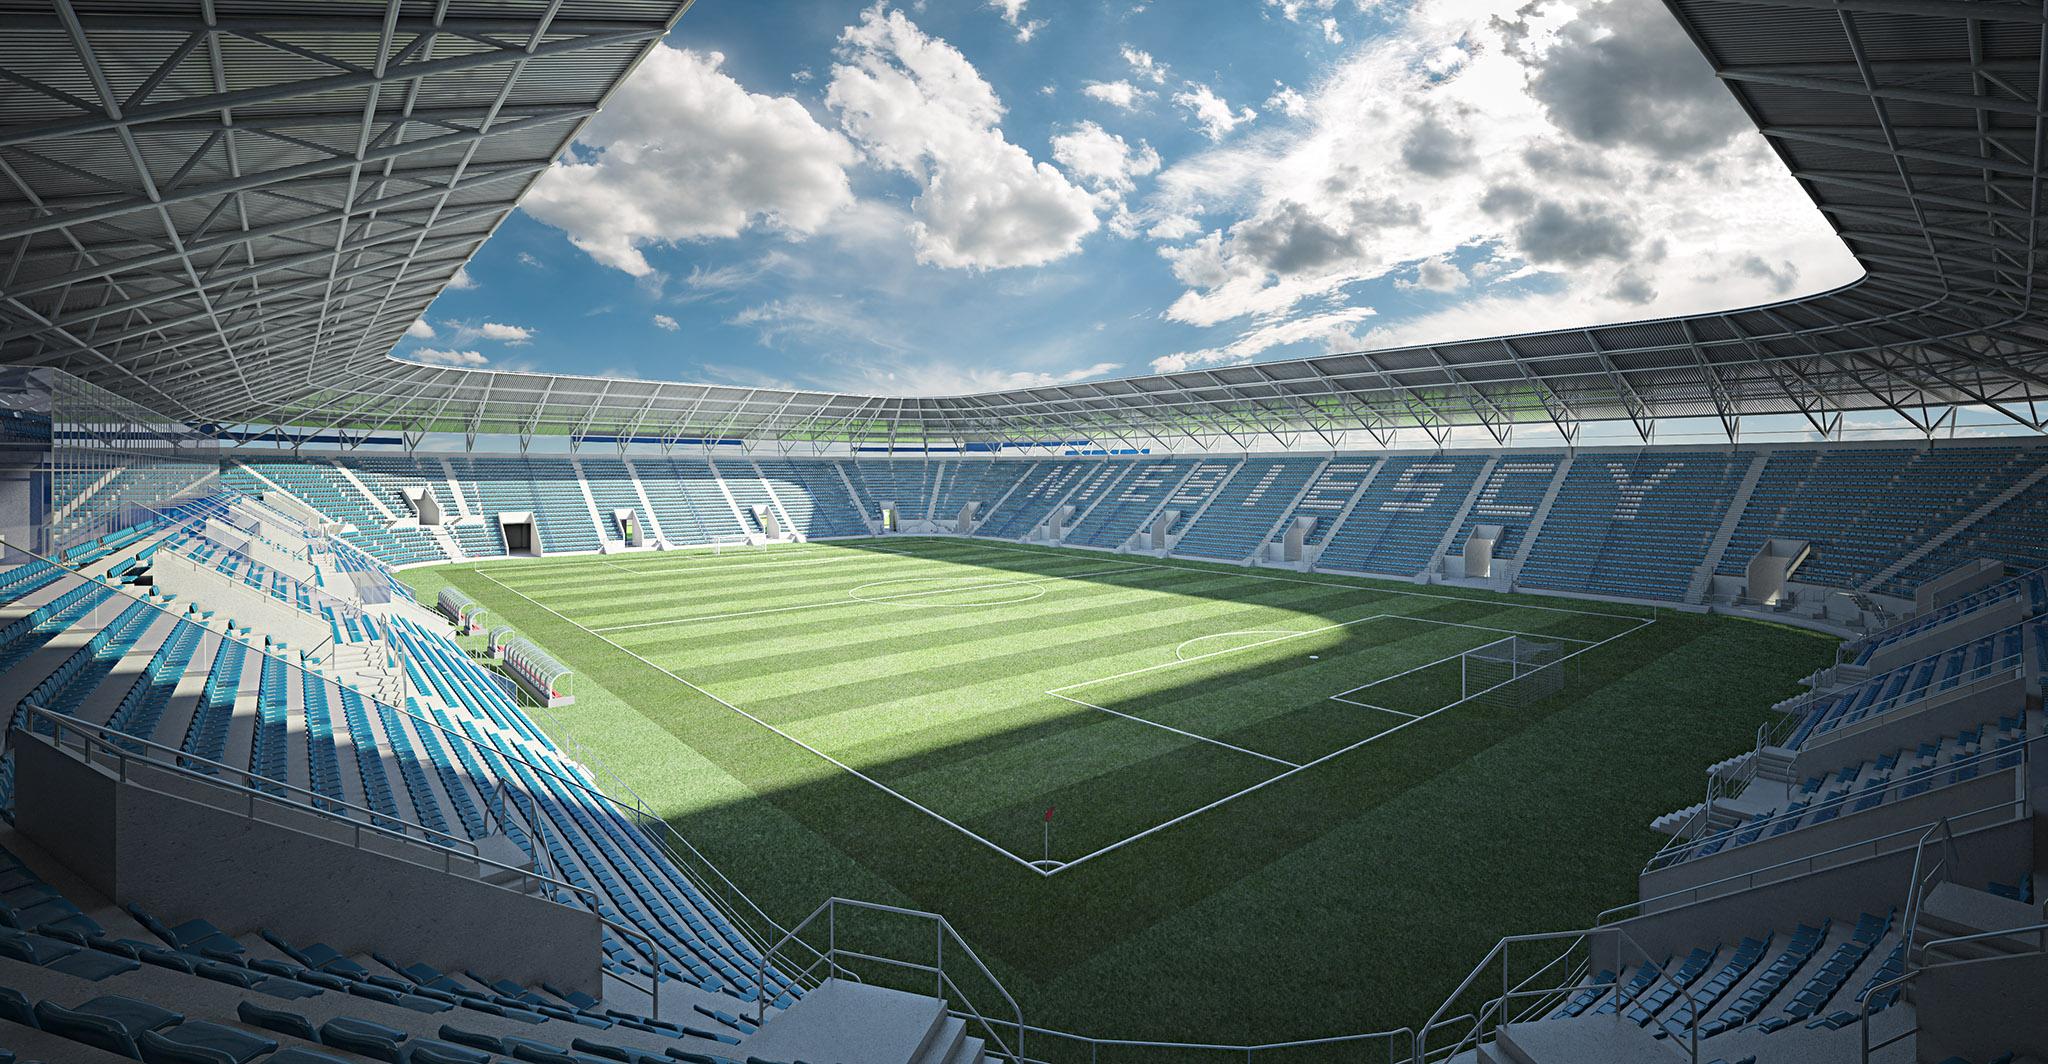 eiropas futbola stadions 3d modelis 3ds max dxf dwg fbx c4d dae ma mb 3dm obj 220265